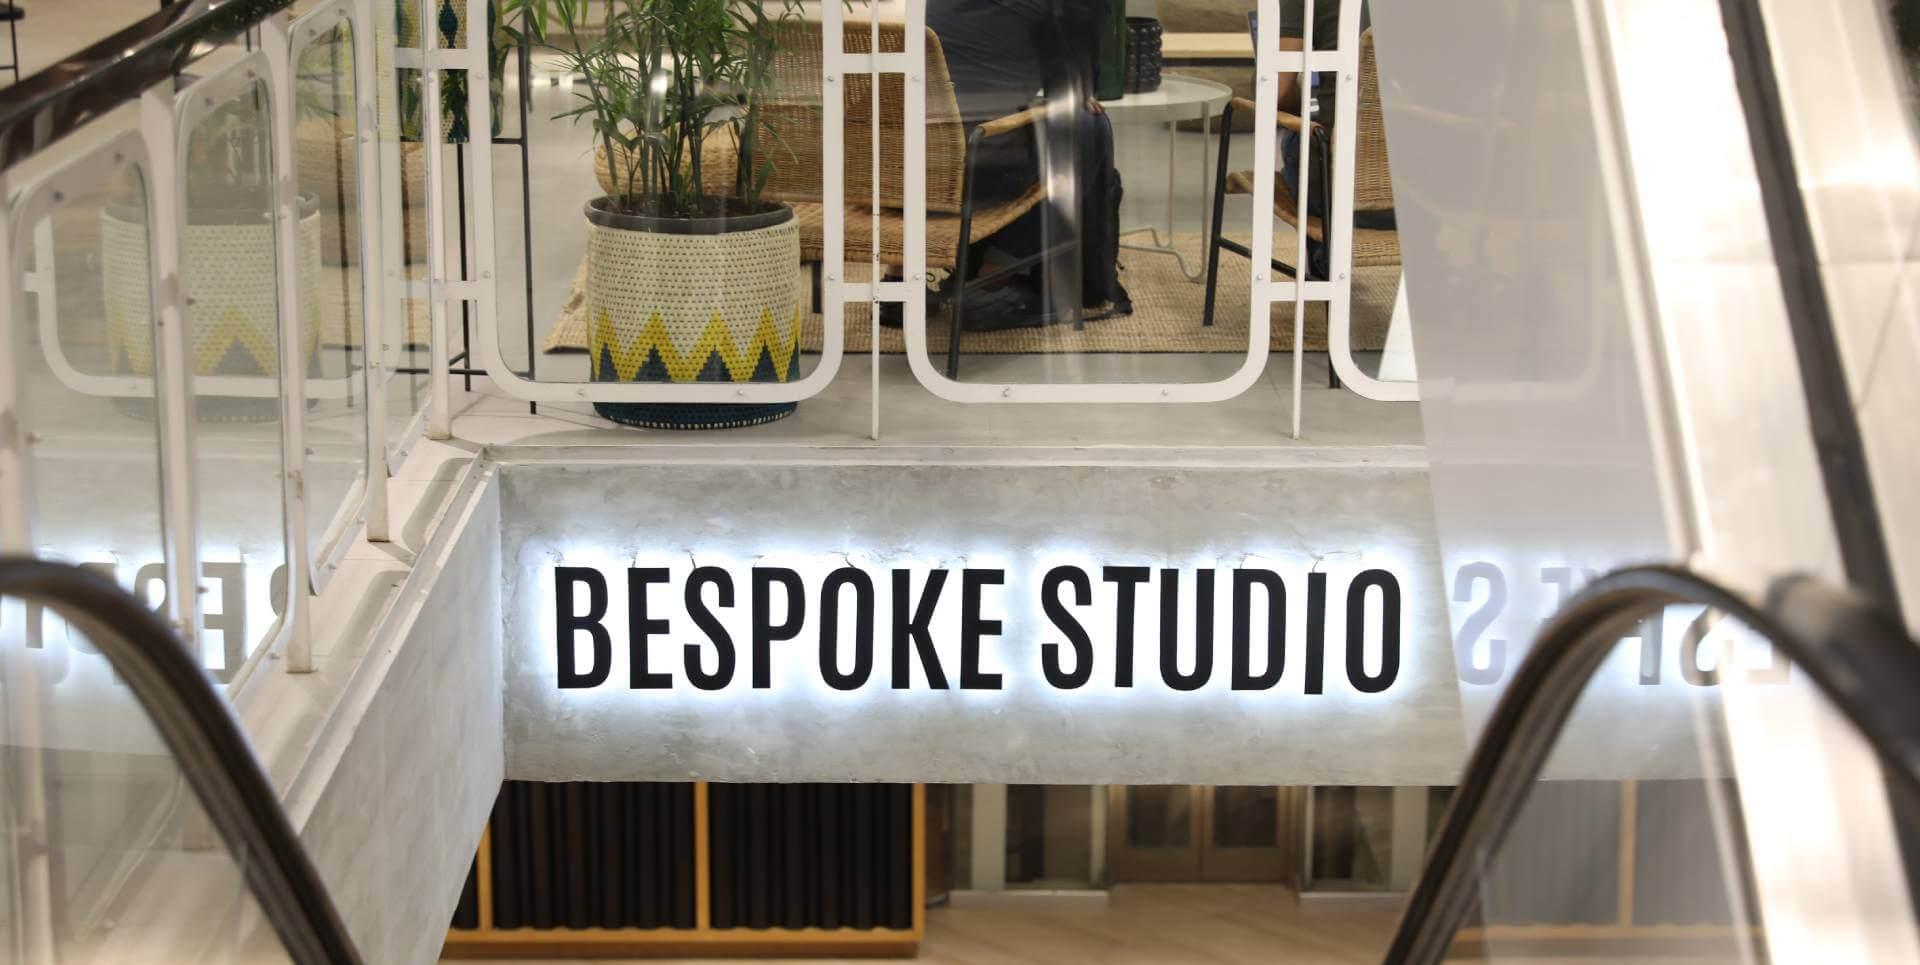 Bespoke Studio